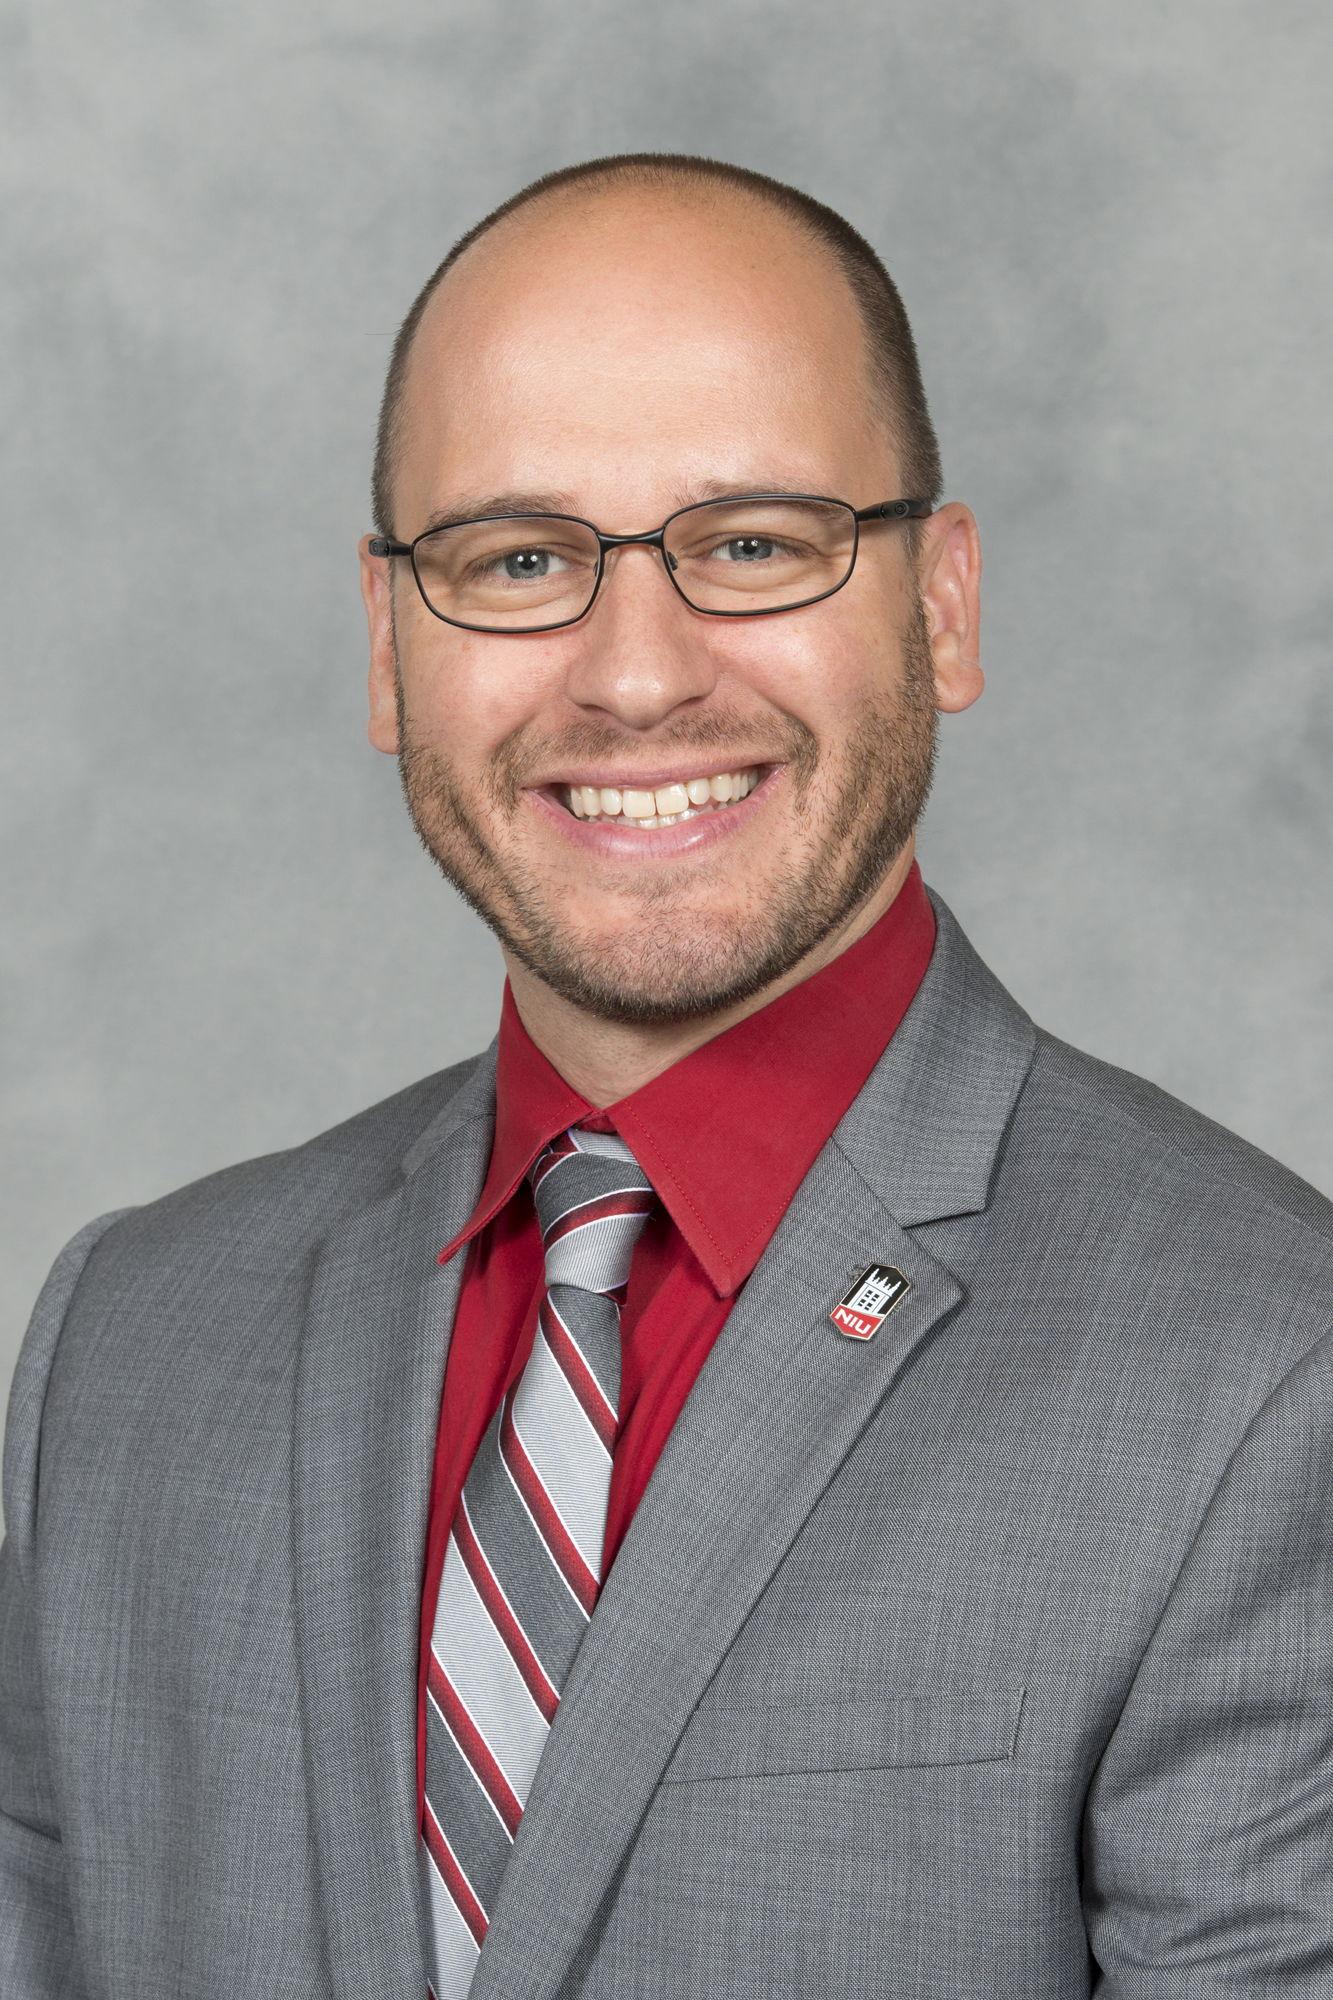 Nicholas E. Grahovec, PhD, LAT, ATC, CSCS